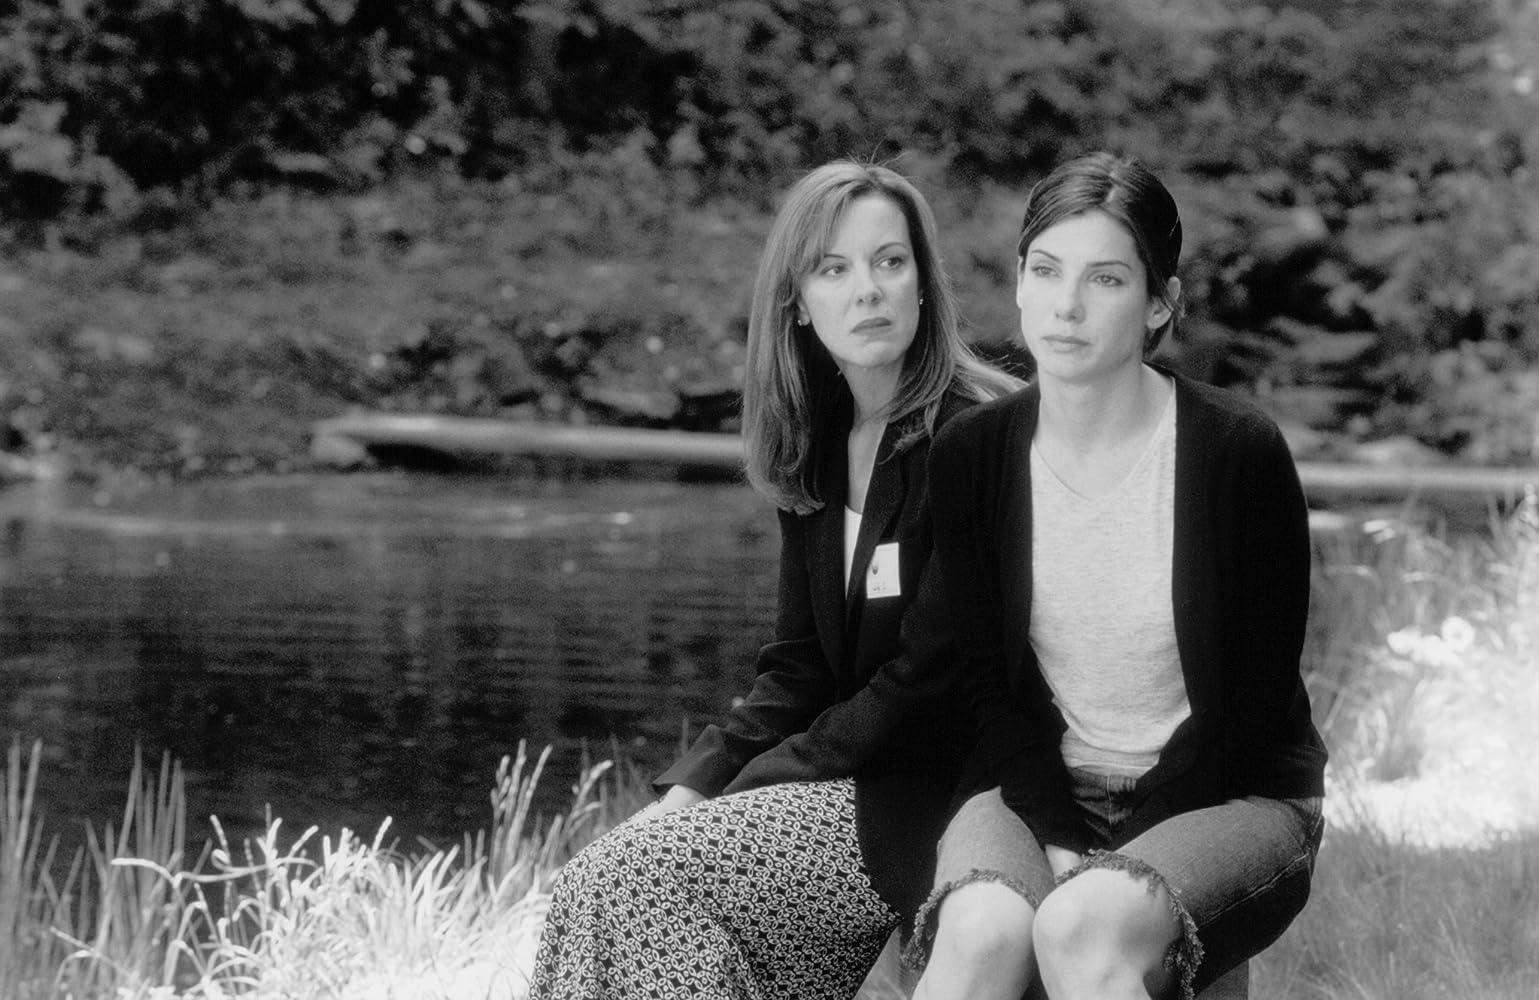 Sandra Bullock and Elizabeth Perkins in 28 Days (2000)